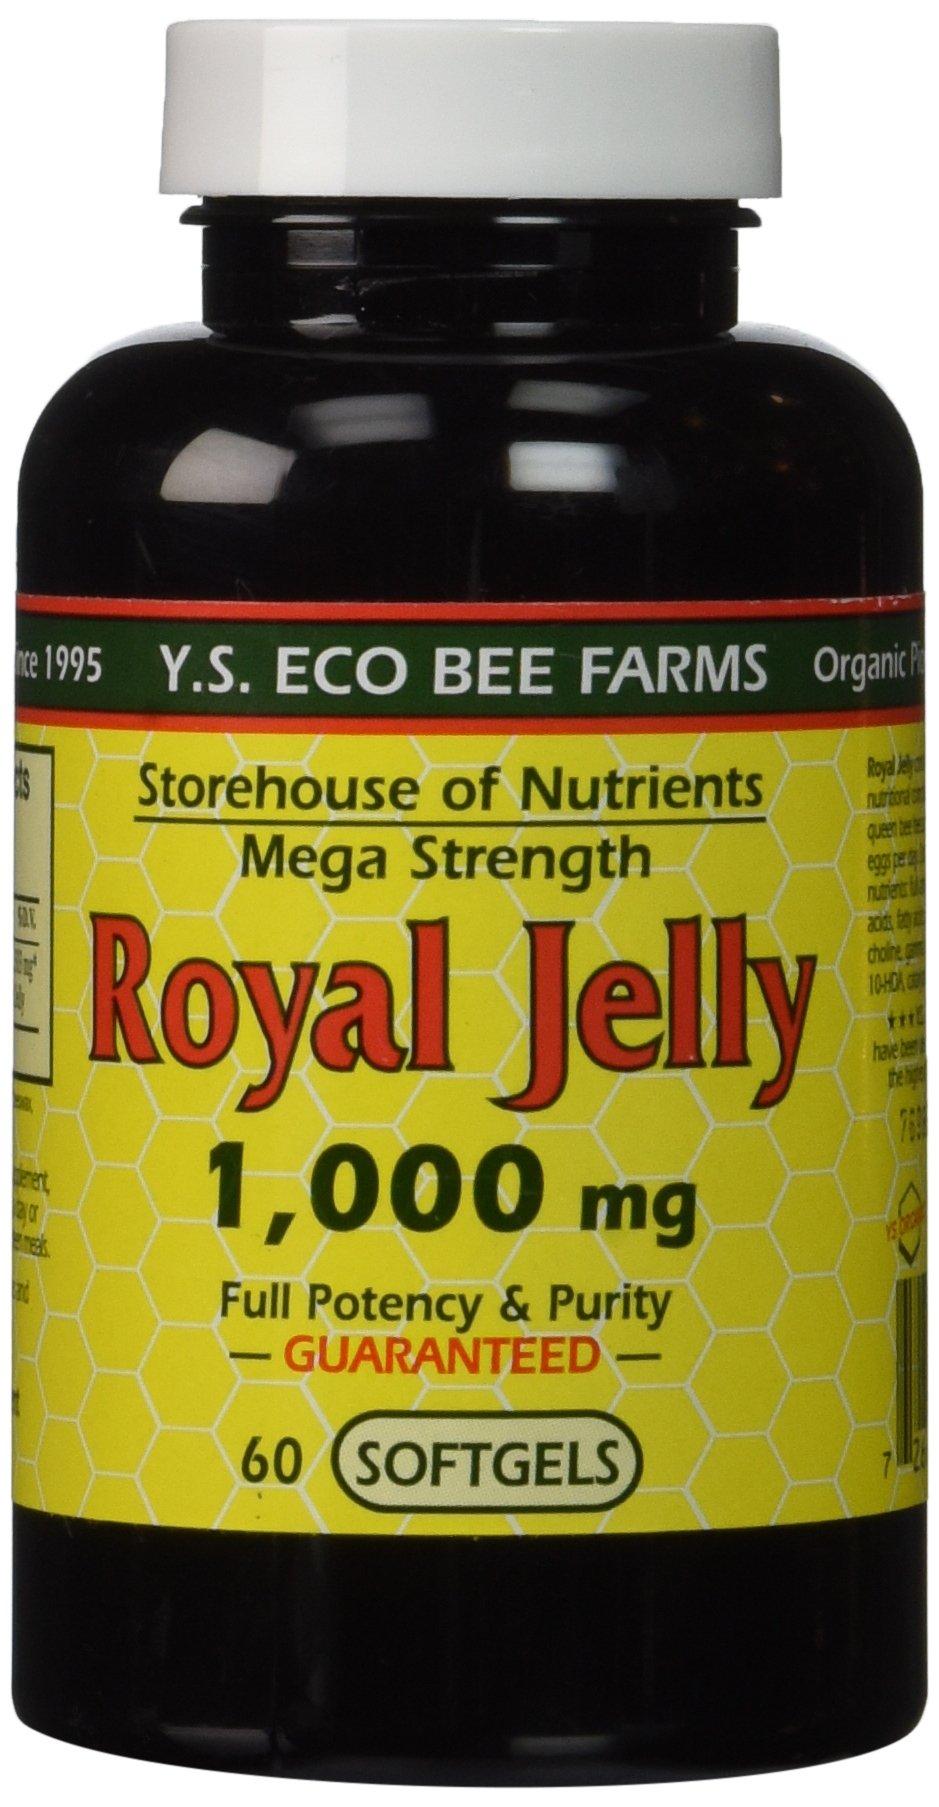 Y.S. Eco Bee Farms Royal Jelly Mega Strength 1,000 mg 60 Sgels